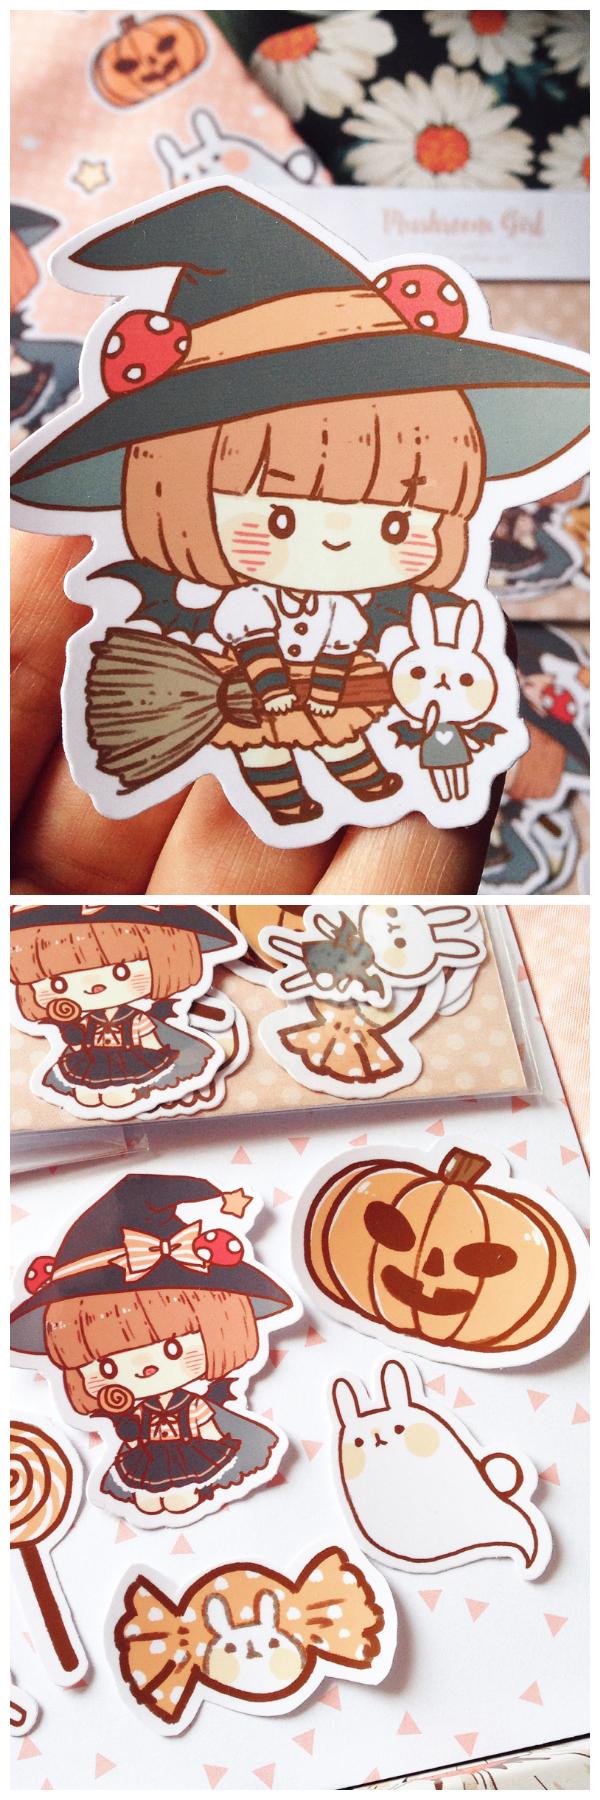 Halloween Stickers Aesthetic.Cute Halloween Stickers And Enamel Pins Sakura Fairies